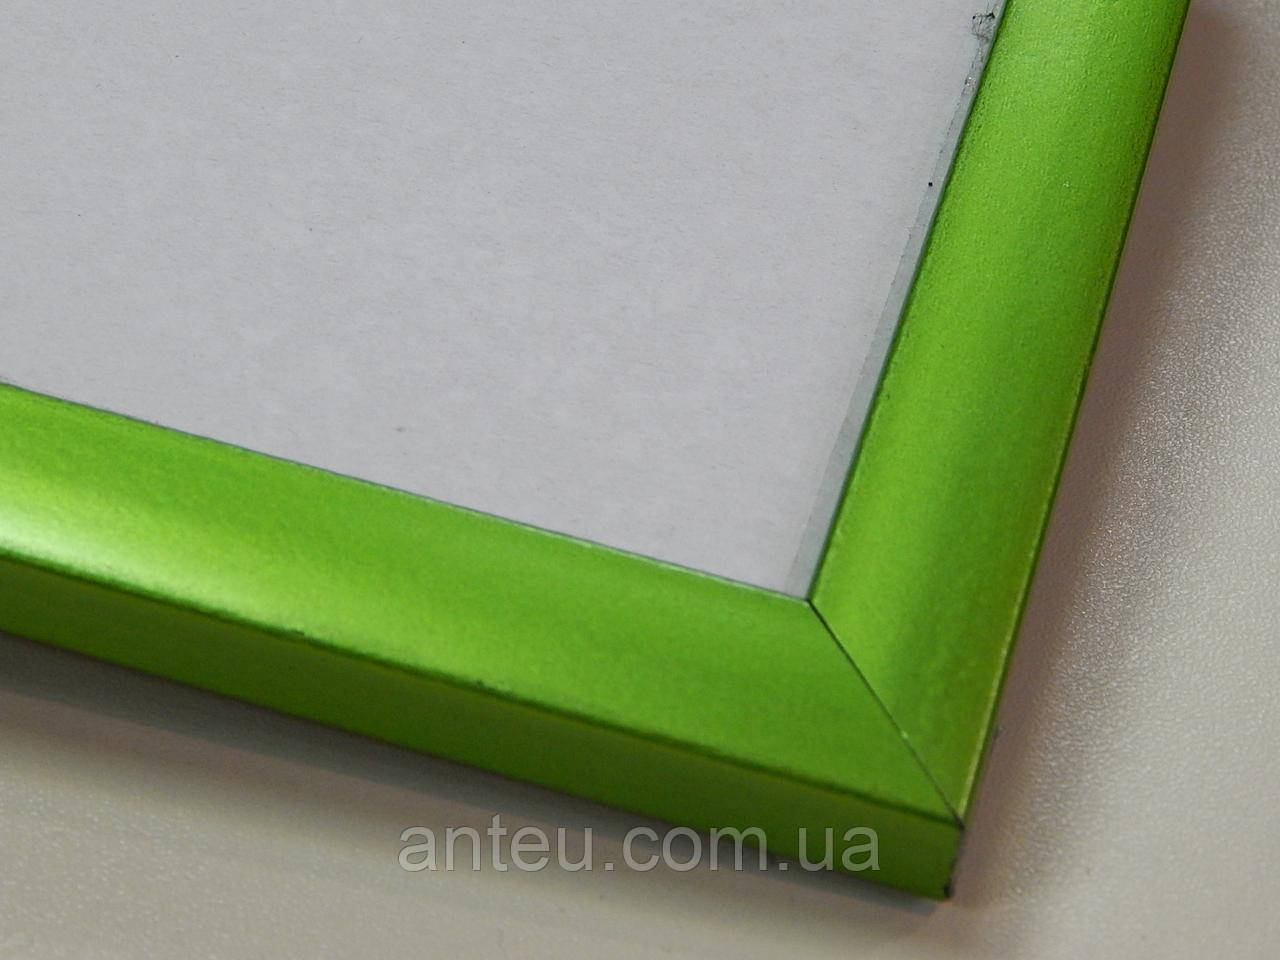 Рамка 10х15.16 мм.Салатовый металлик.